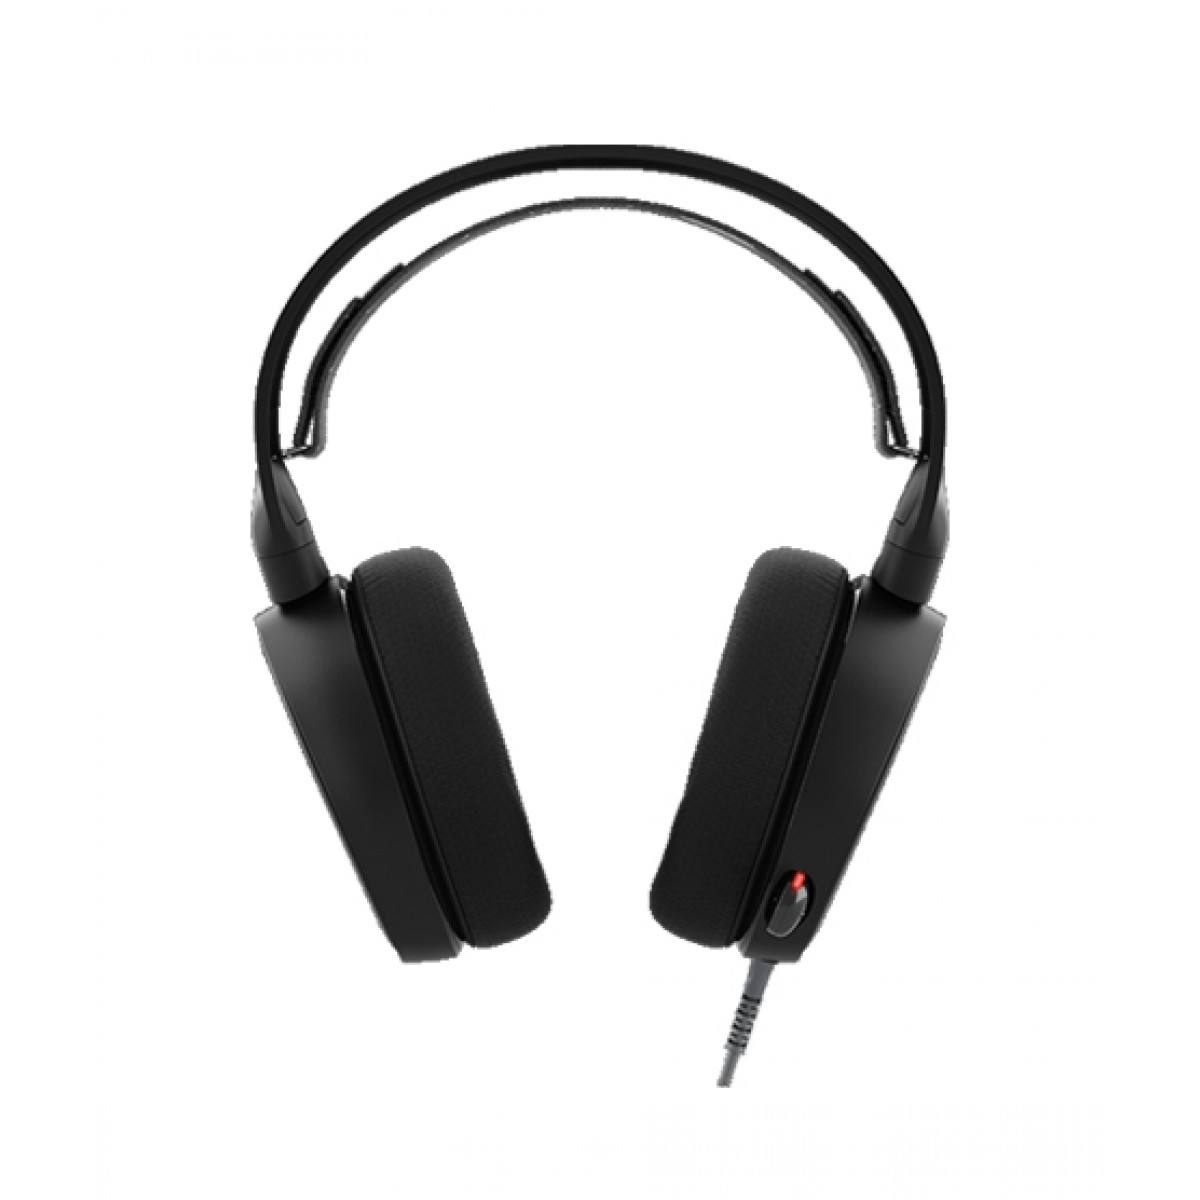 a54da8b8d71 SteelSeries Arctis 5 Gaming Headphones Price in Pakistan   Buy SteelSeries  Arctis 5 Gaming Headphones Black   iShopping.pk